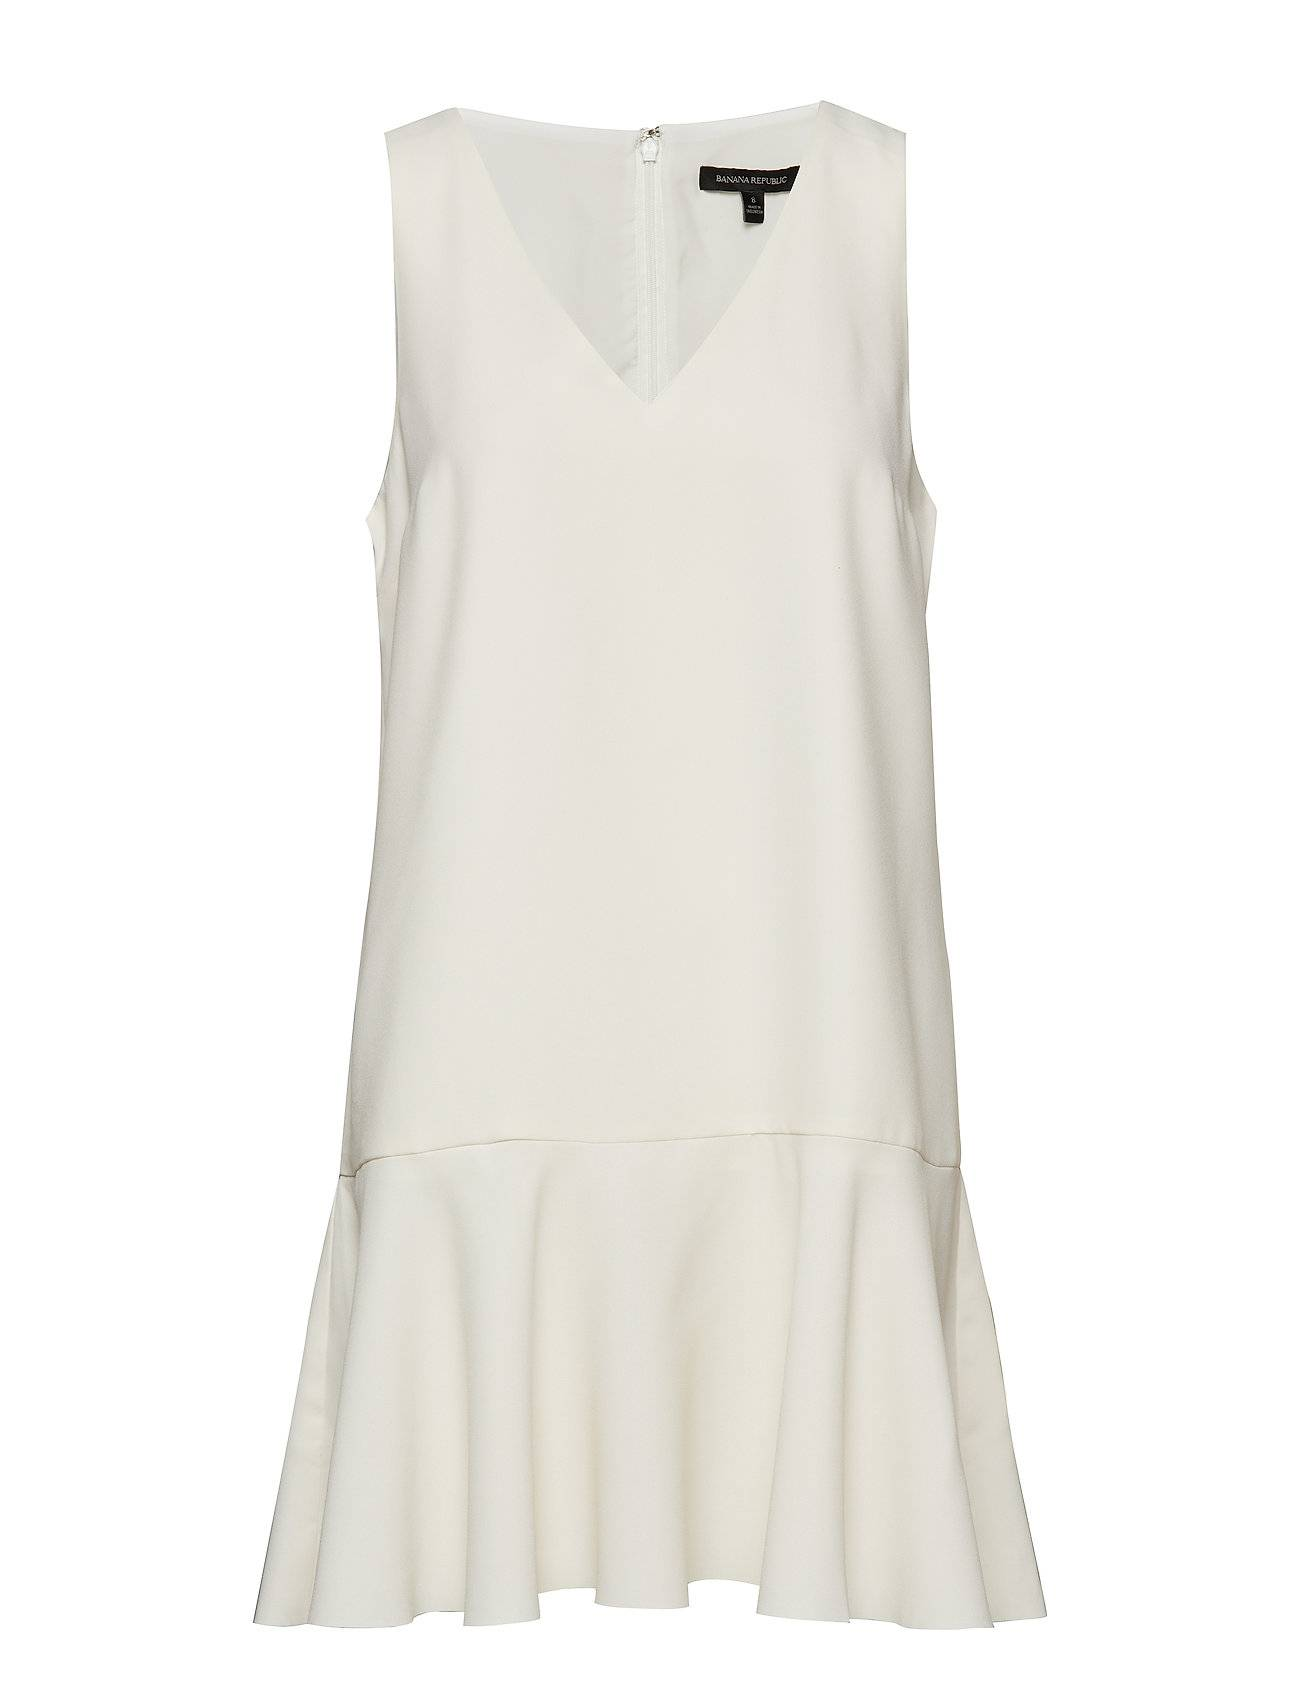 Image of Banana Republic Drop-Waist Shift Dress Lyhyt Mekko Valkoinen Banana Republic